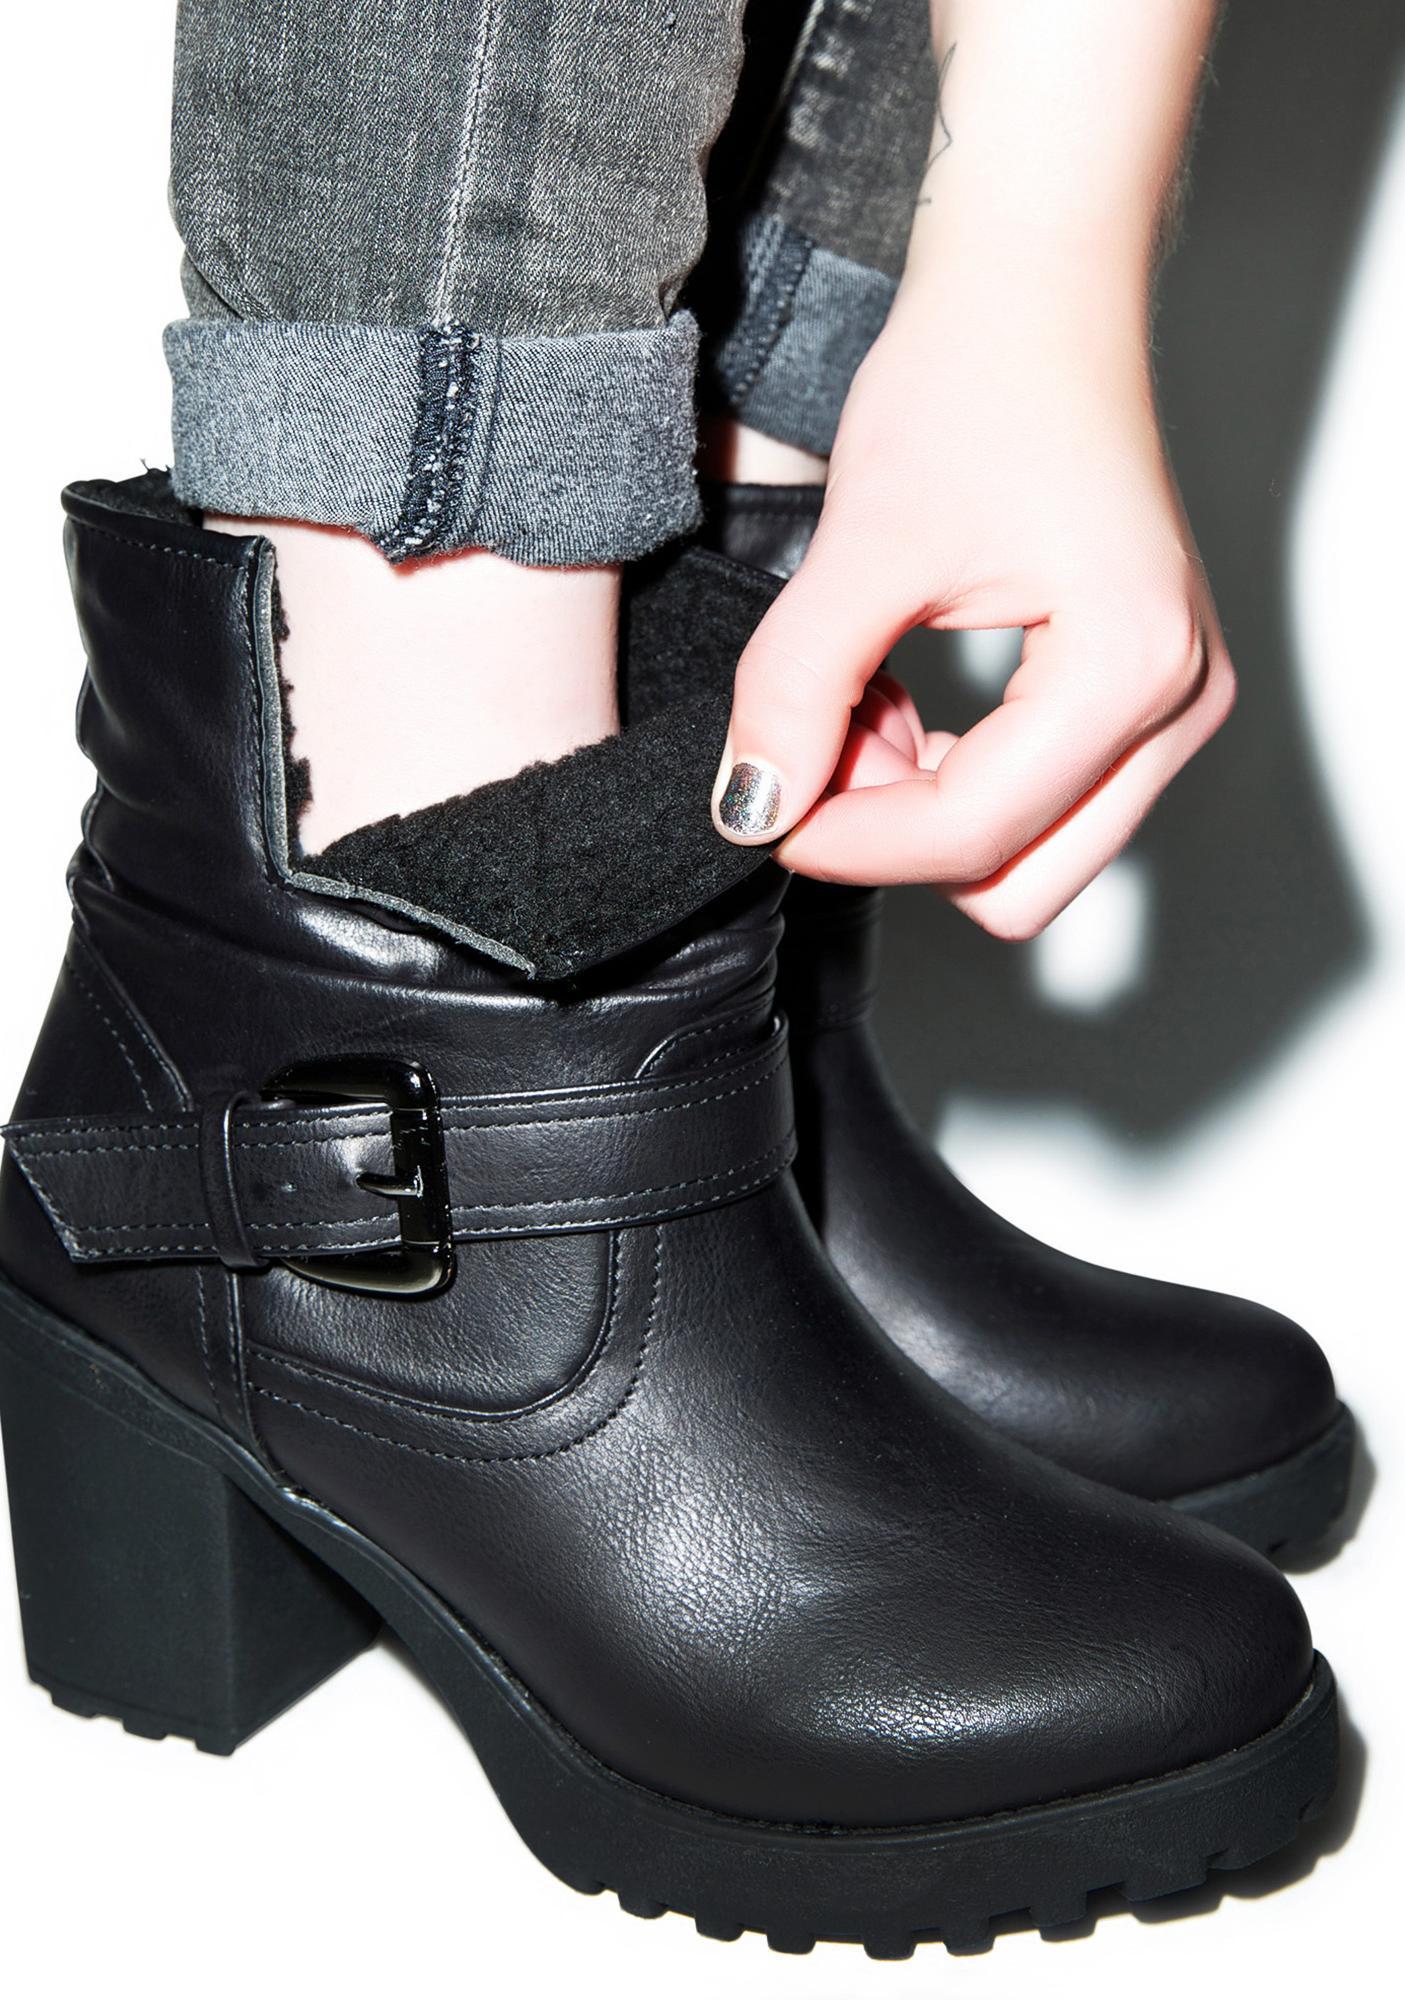 Sullana Boots